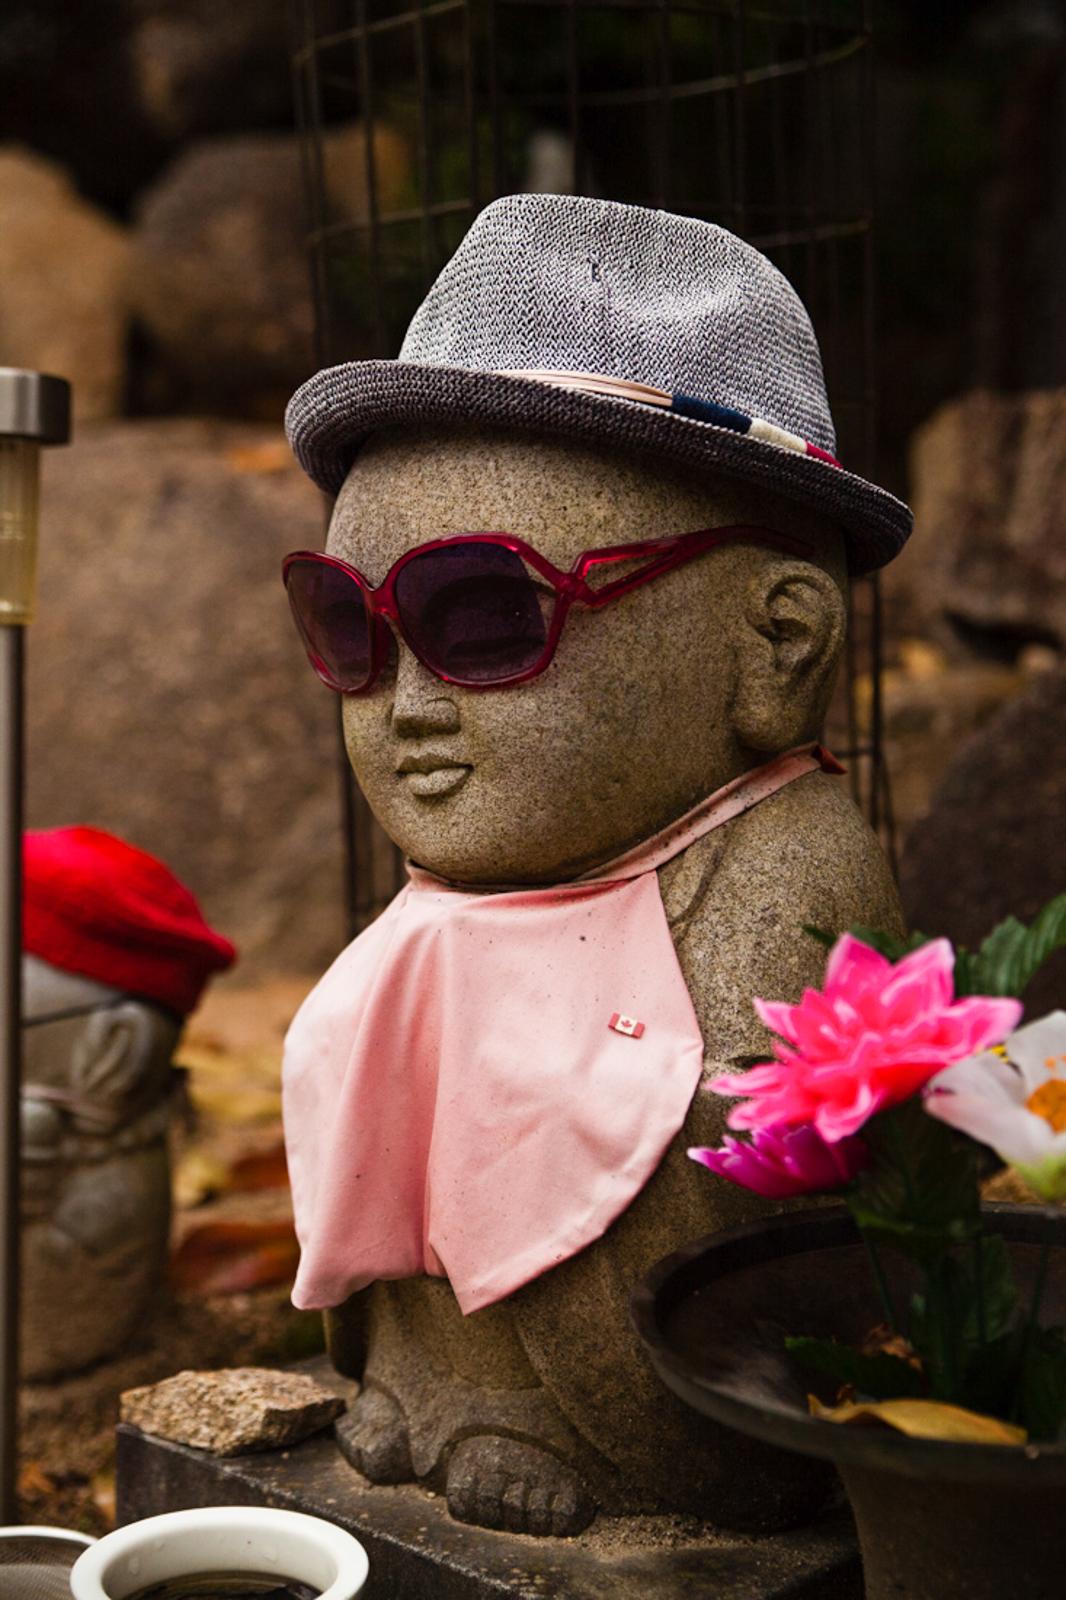 Kiezu-no-hi, temple Kiezu-no-hi, mont misen, miyajima